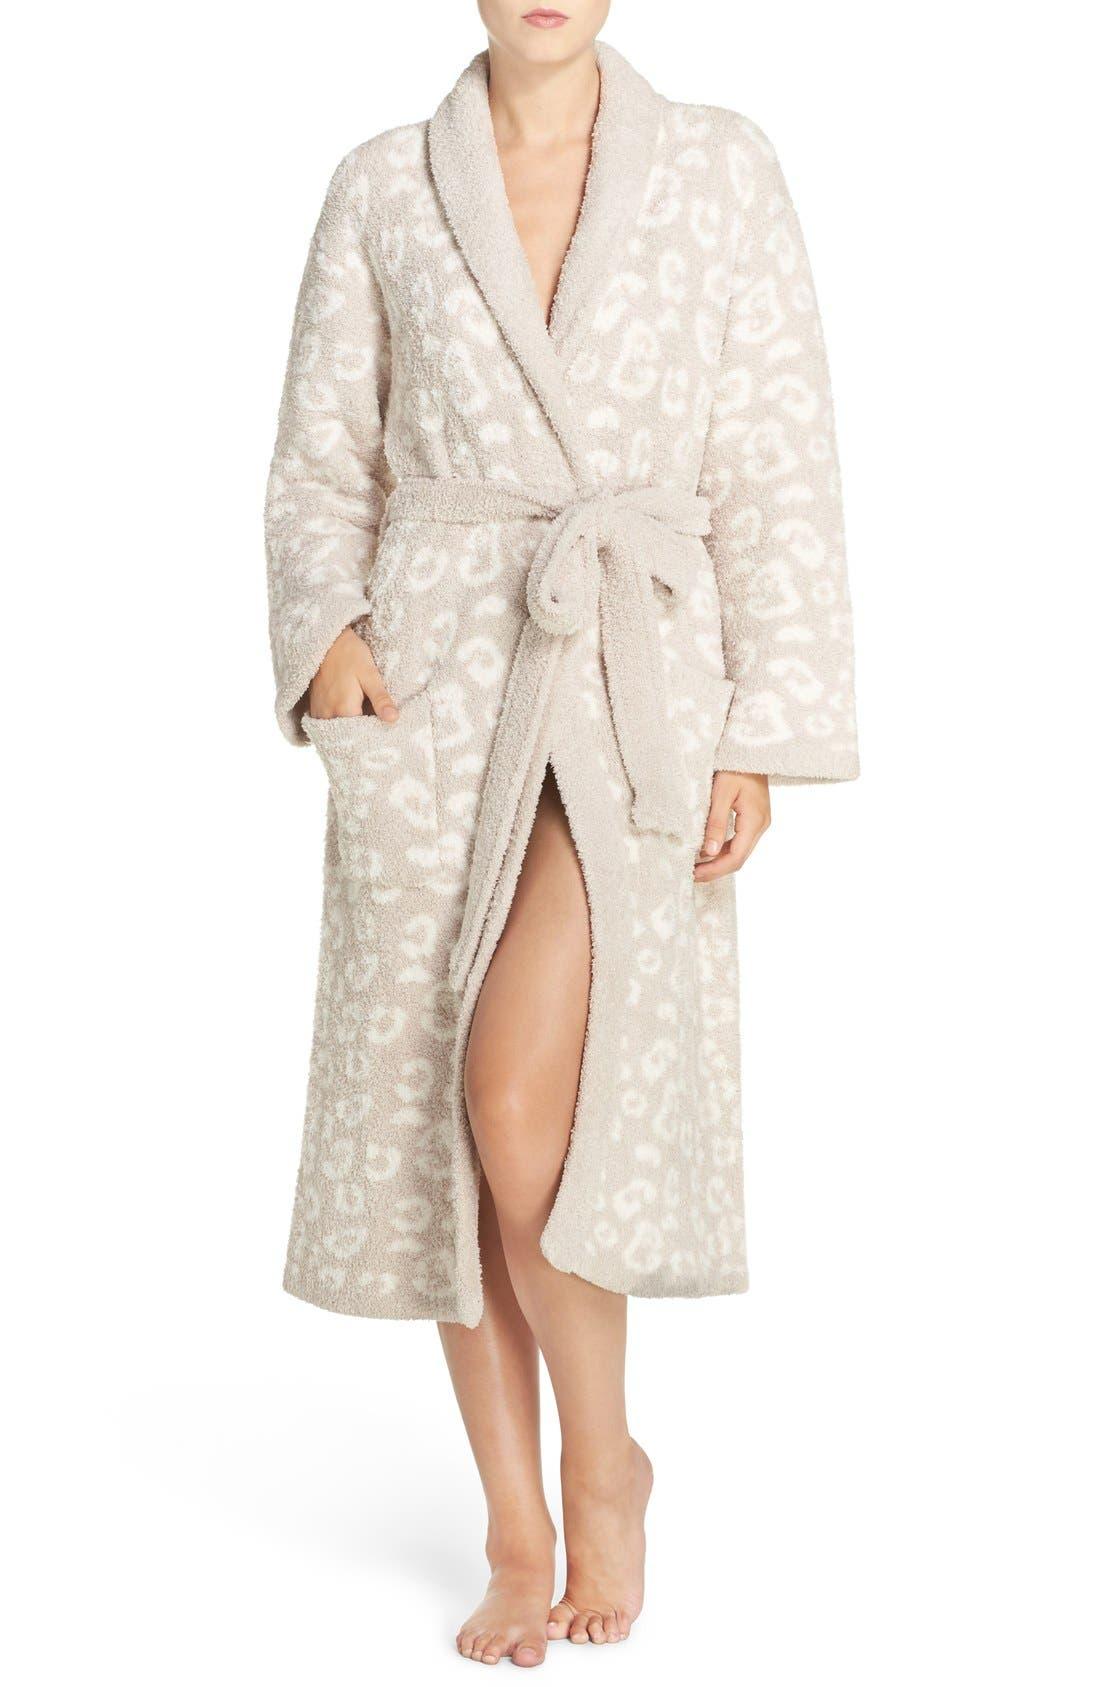 CozyChic<sup>®</sup> Robe,                         Main,                         color, Stone/ Cream